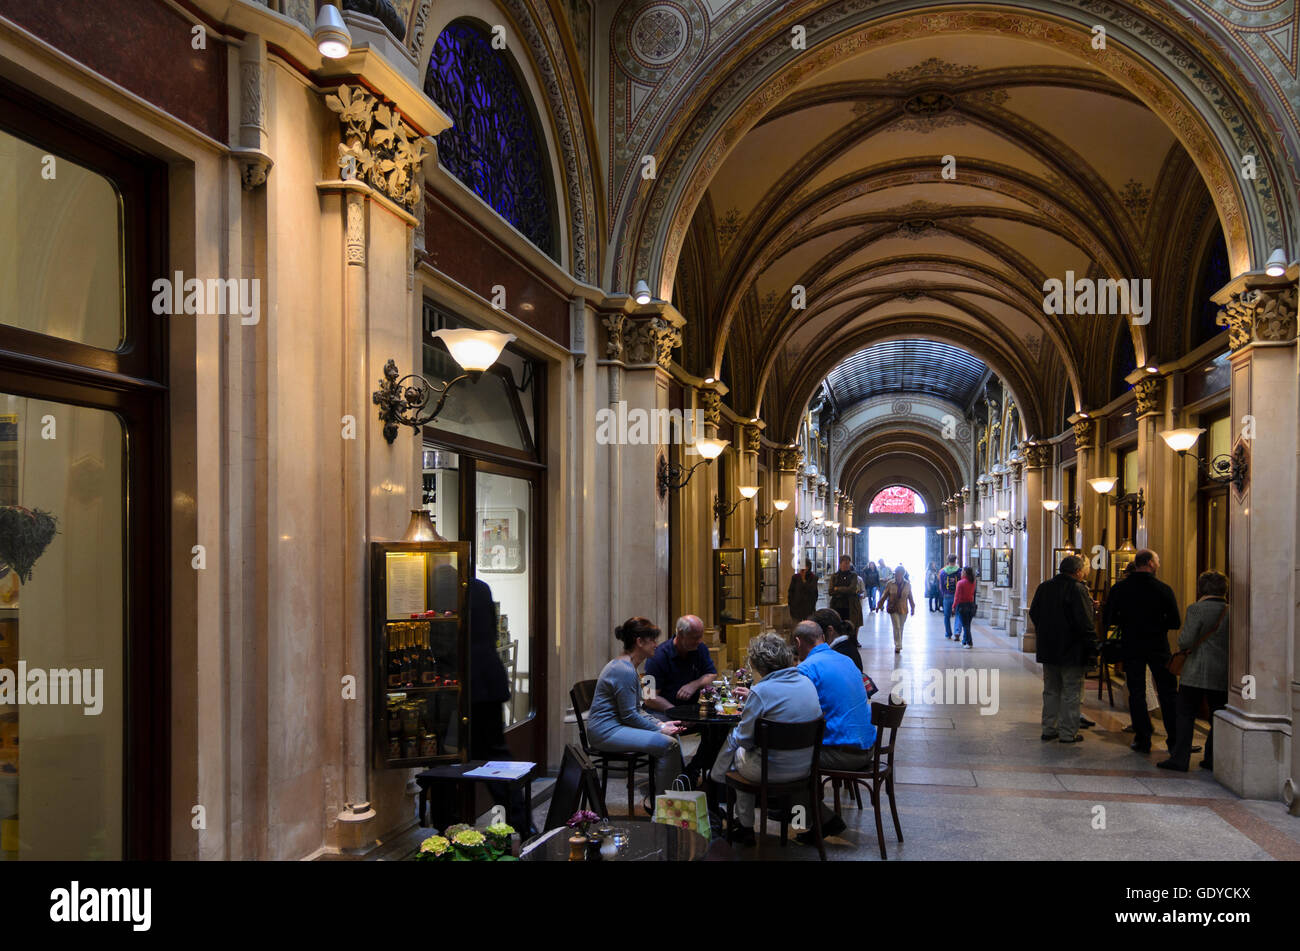 Wien, Vienna: Shopping arcade in the Palais Ferstel between Herrengasse and Freyung, Austria, Wien, 01. Stock Photo